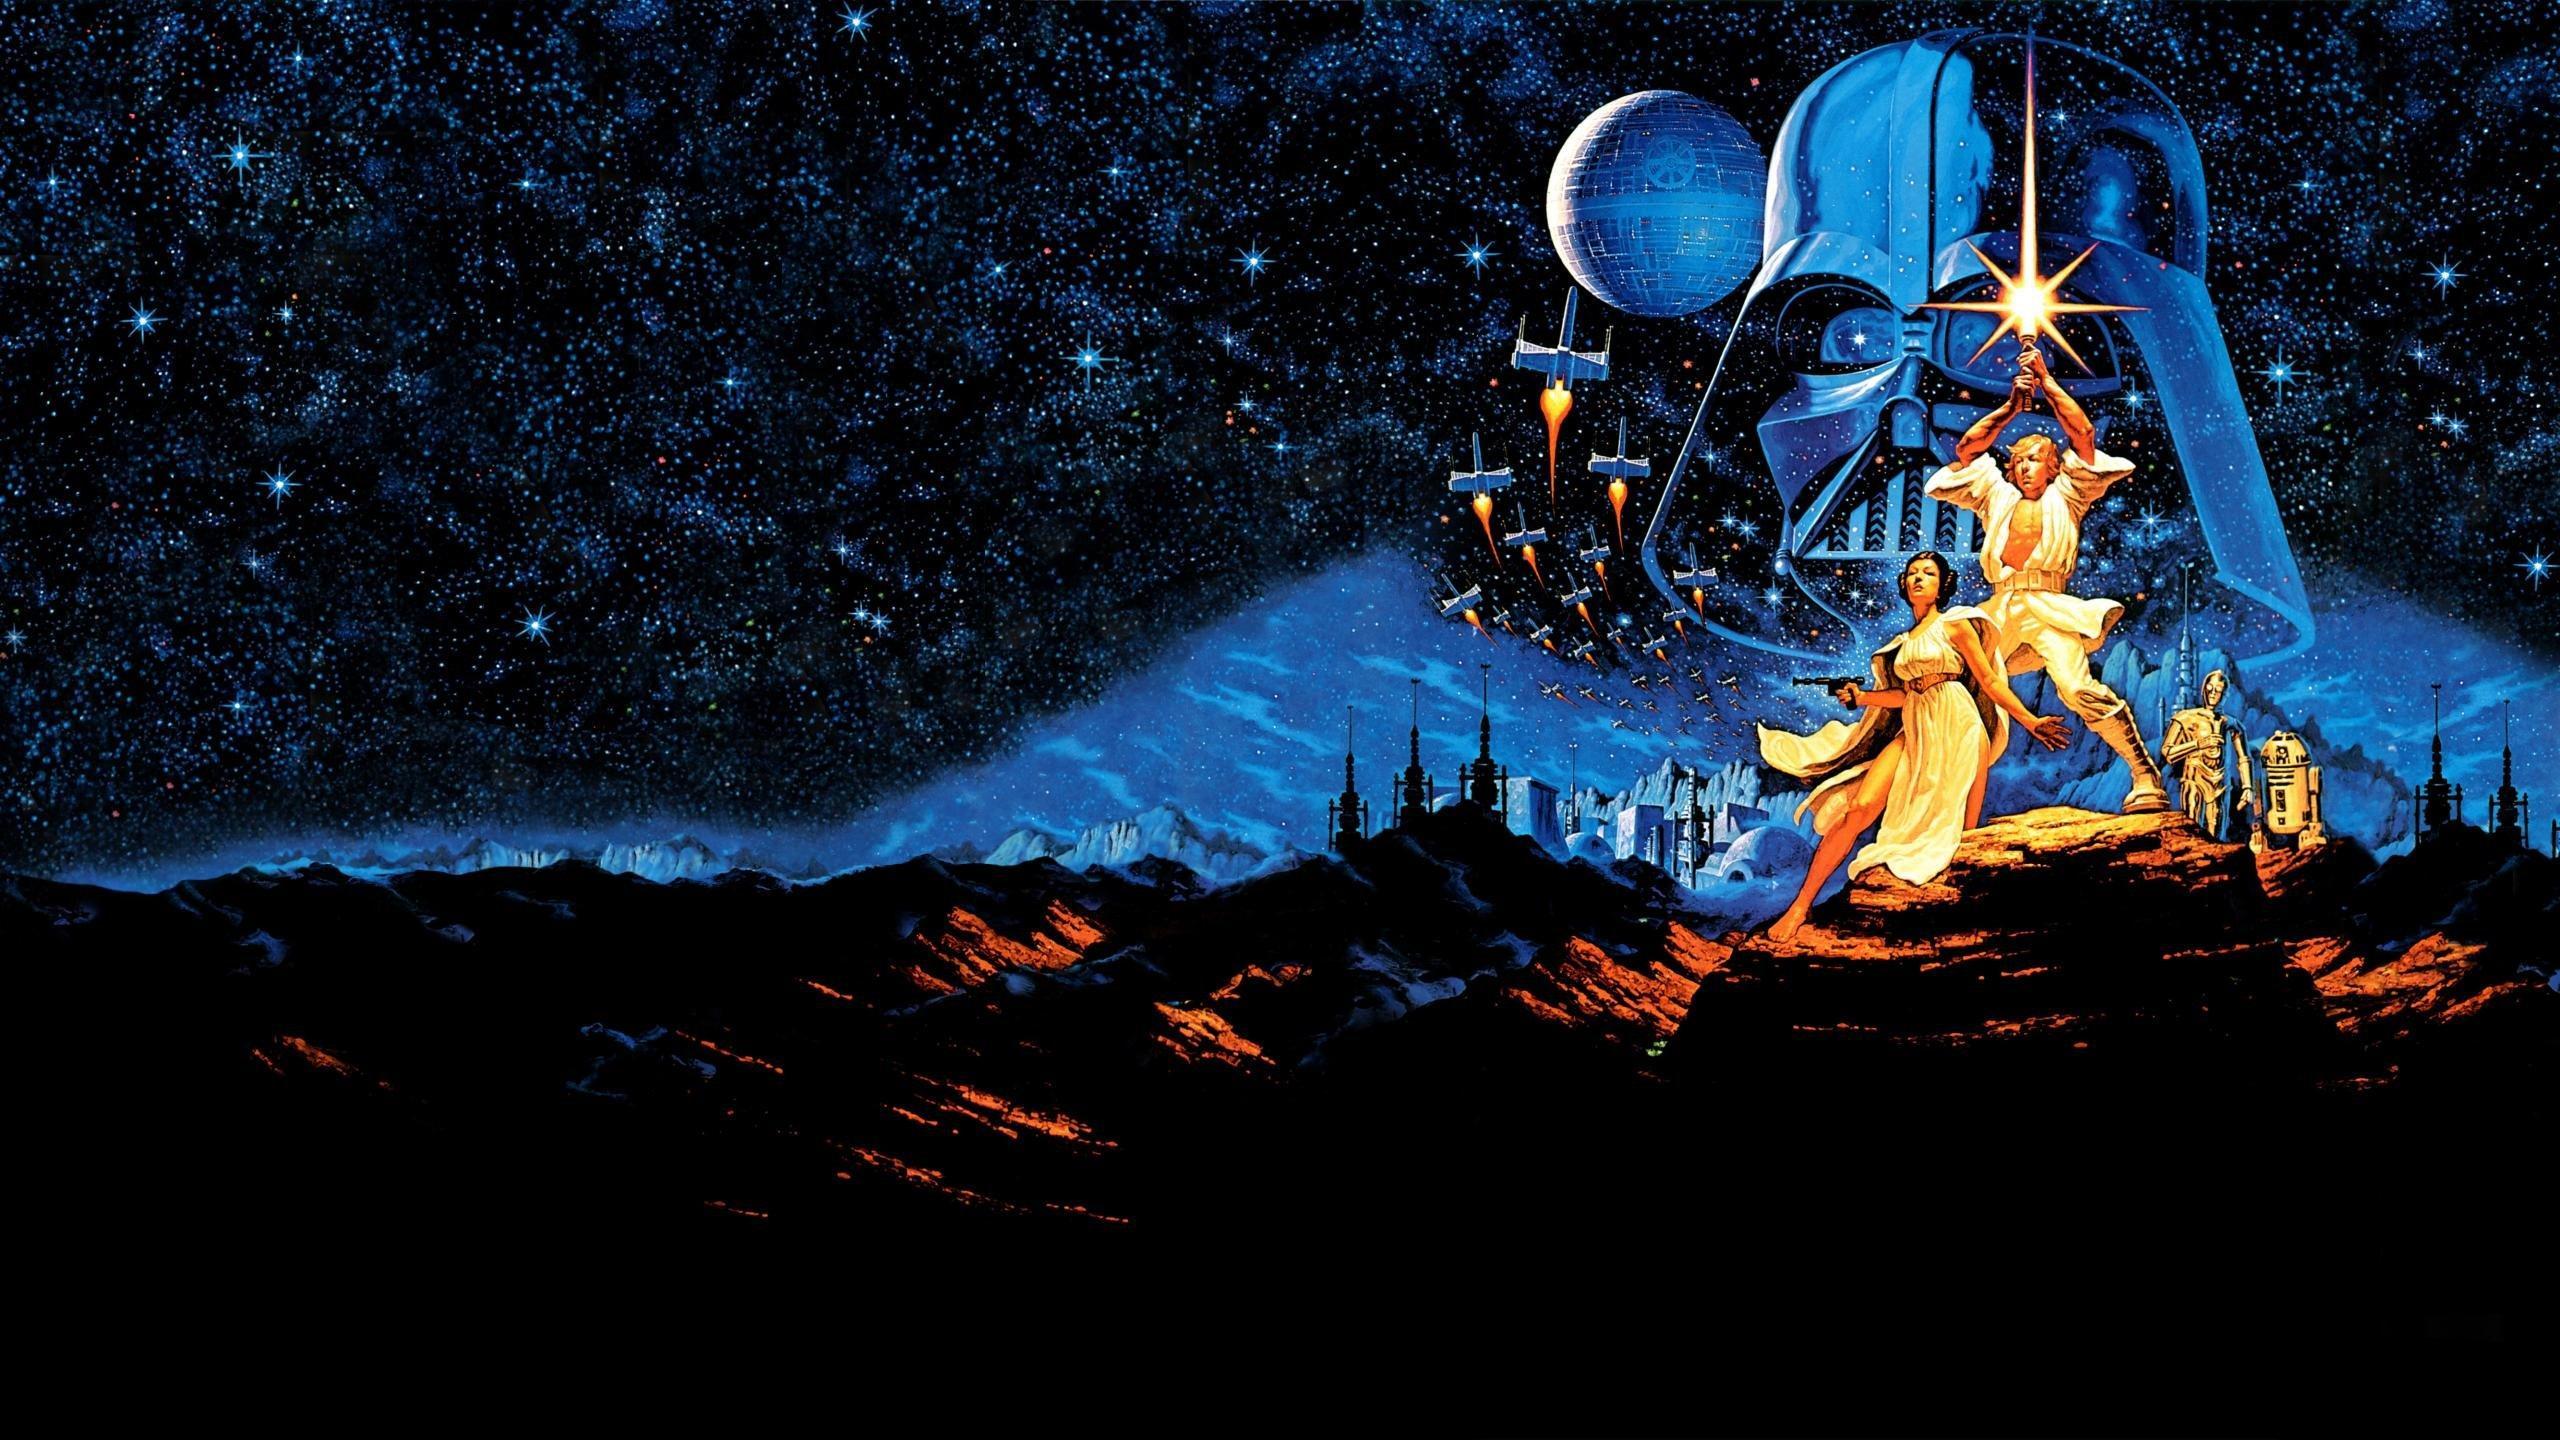 Download Star Wars 2560x1440 Wallpaper Hd Backgrounds Download Itl Cat